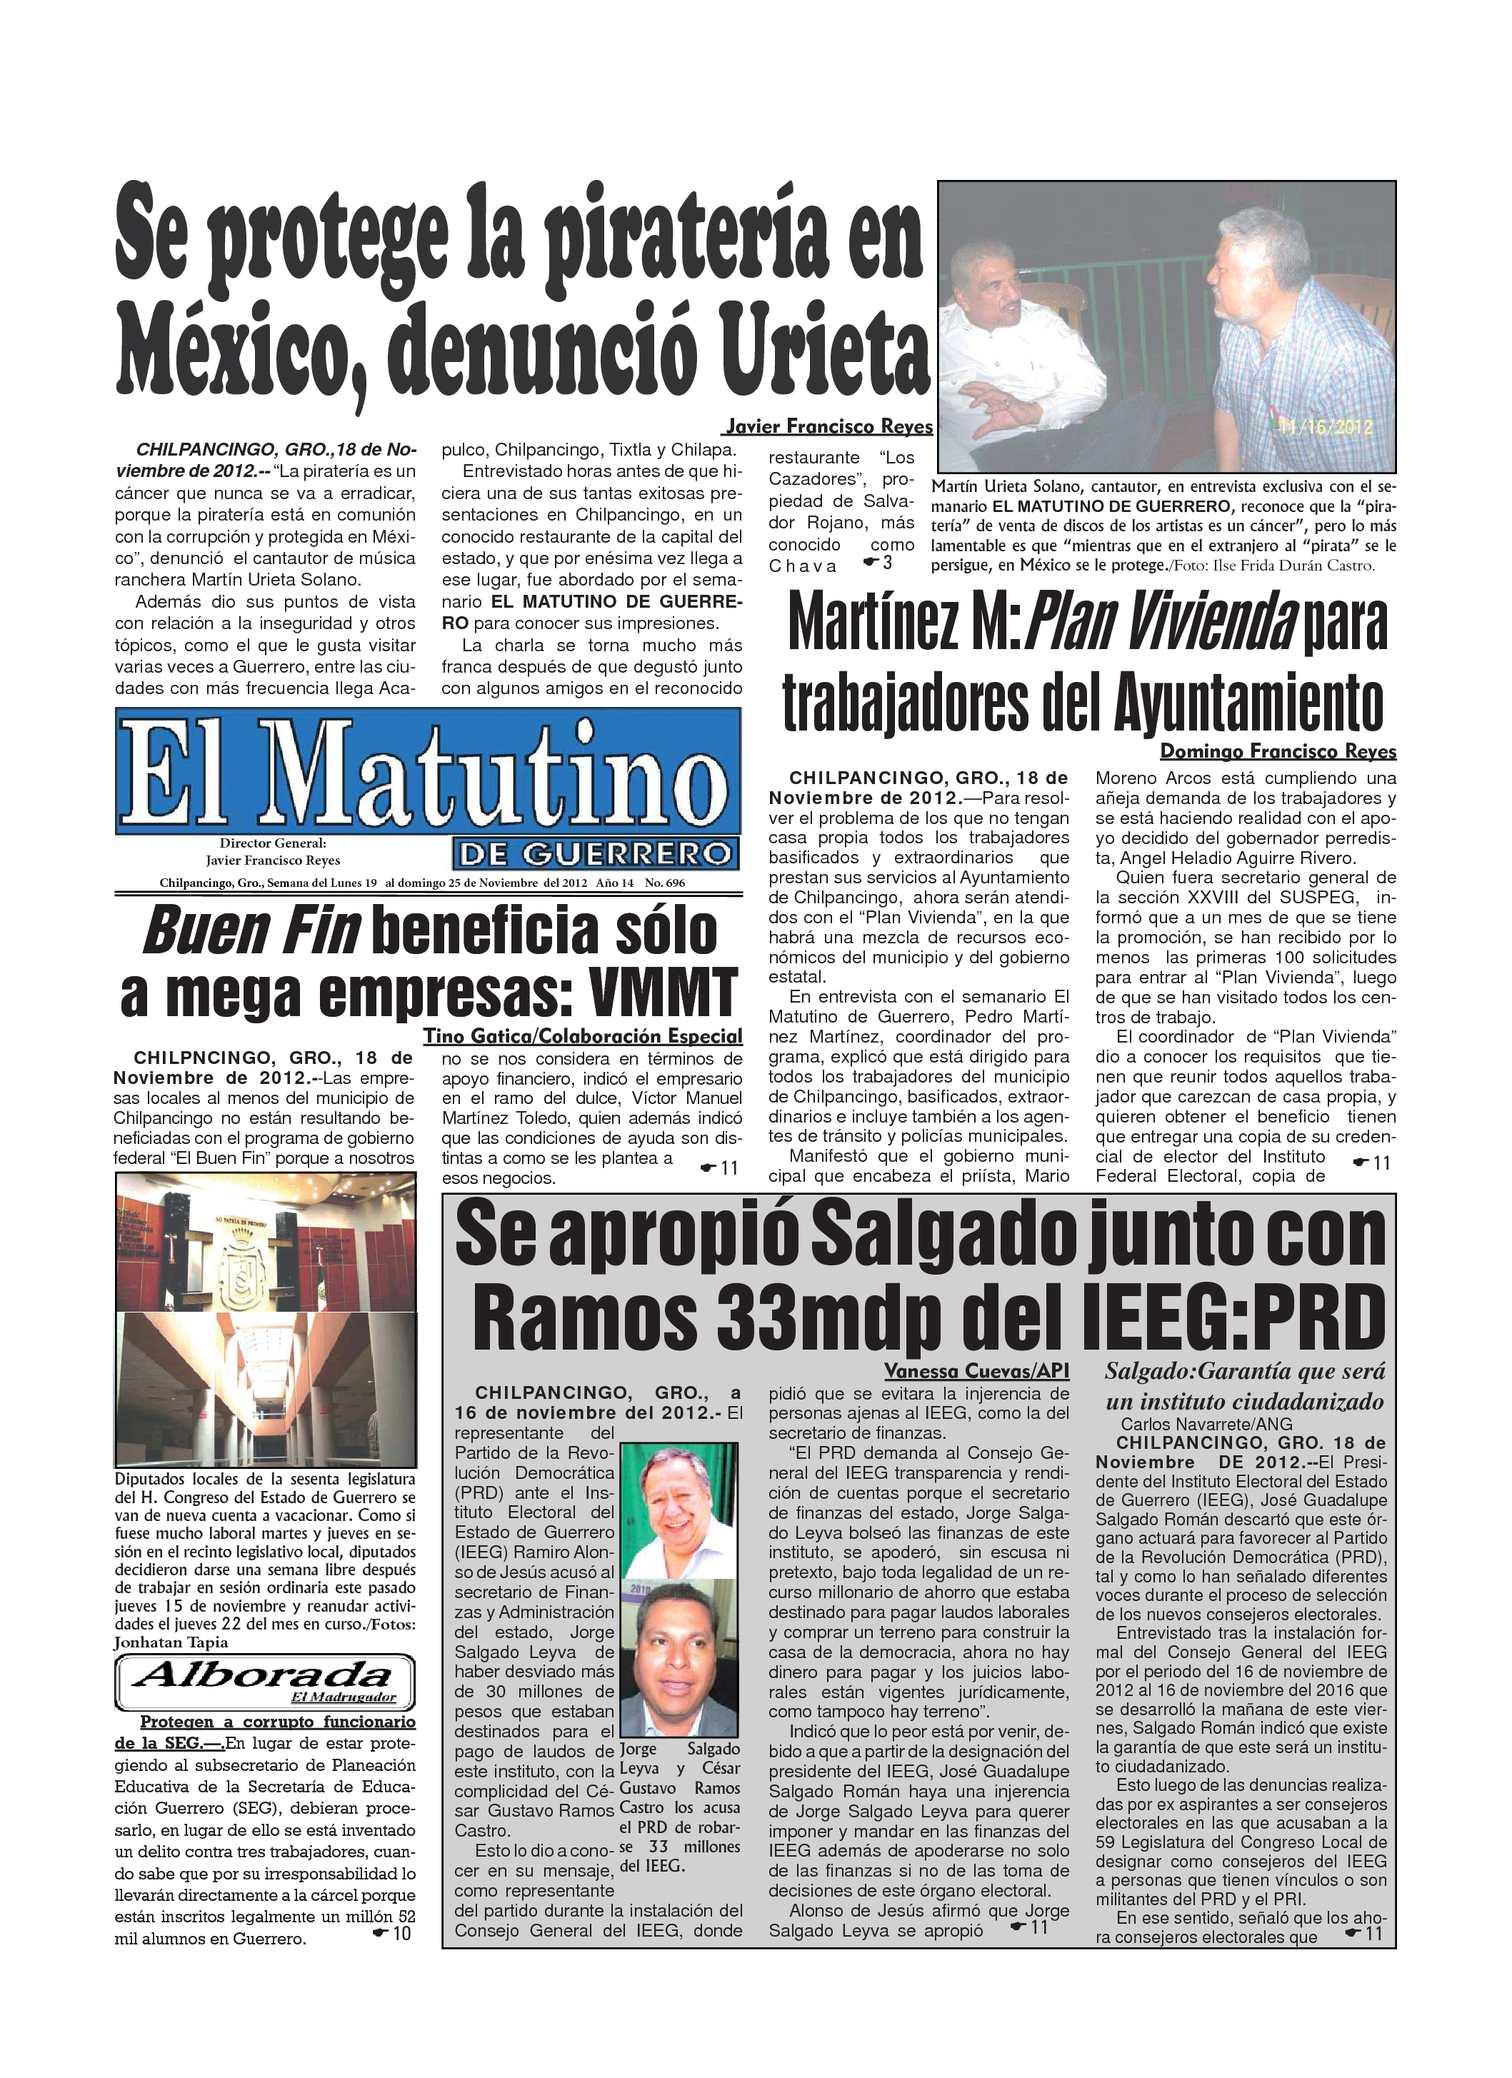 Calaméo - El Matutino 19-25 de noviembre